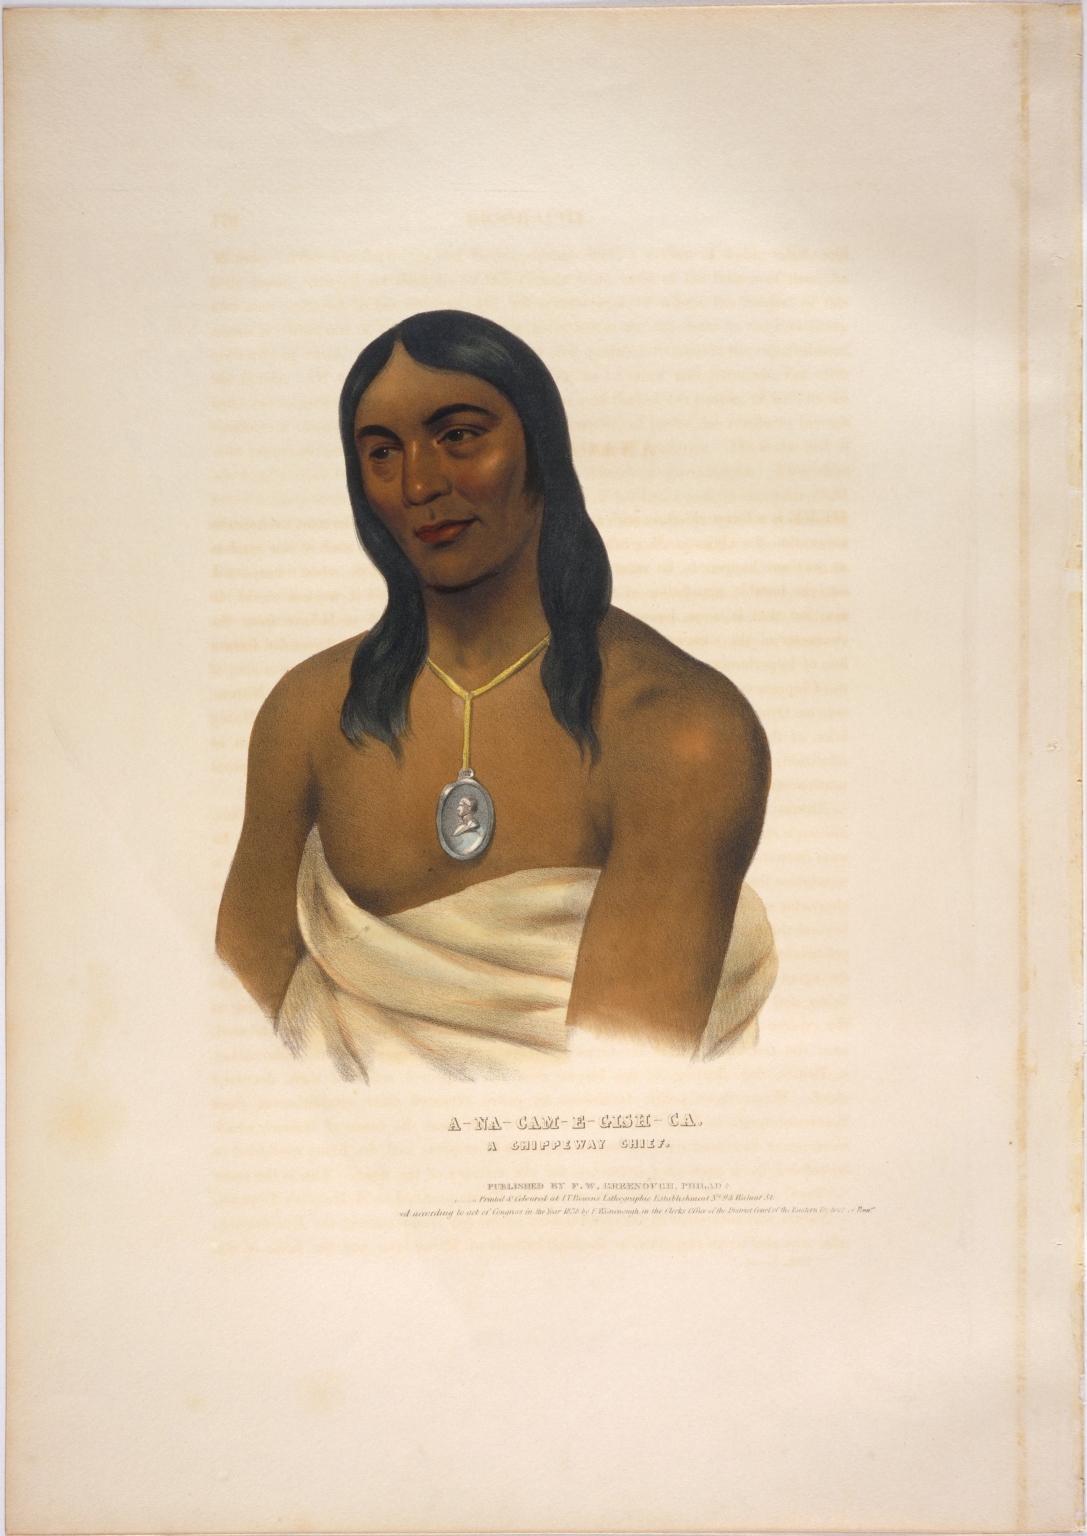 A-na-cam-e-gish-ca, a Chippeway chief